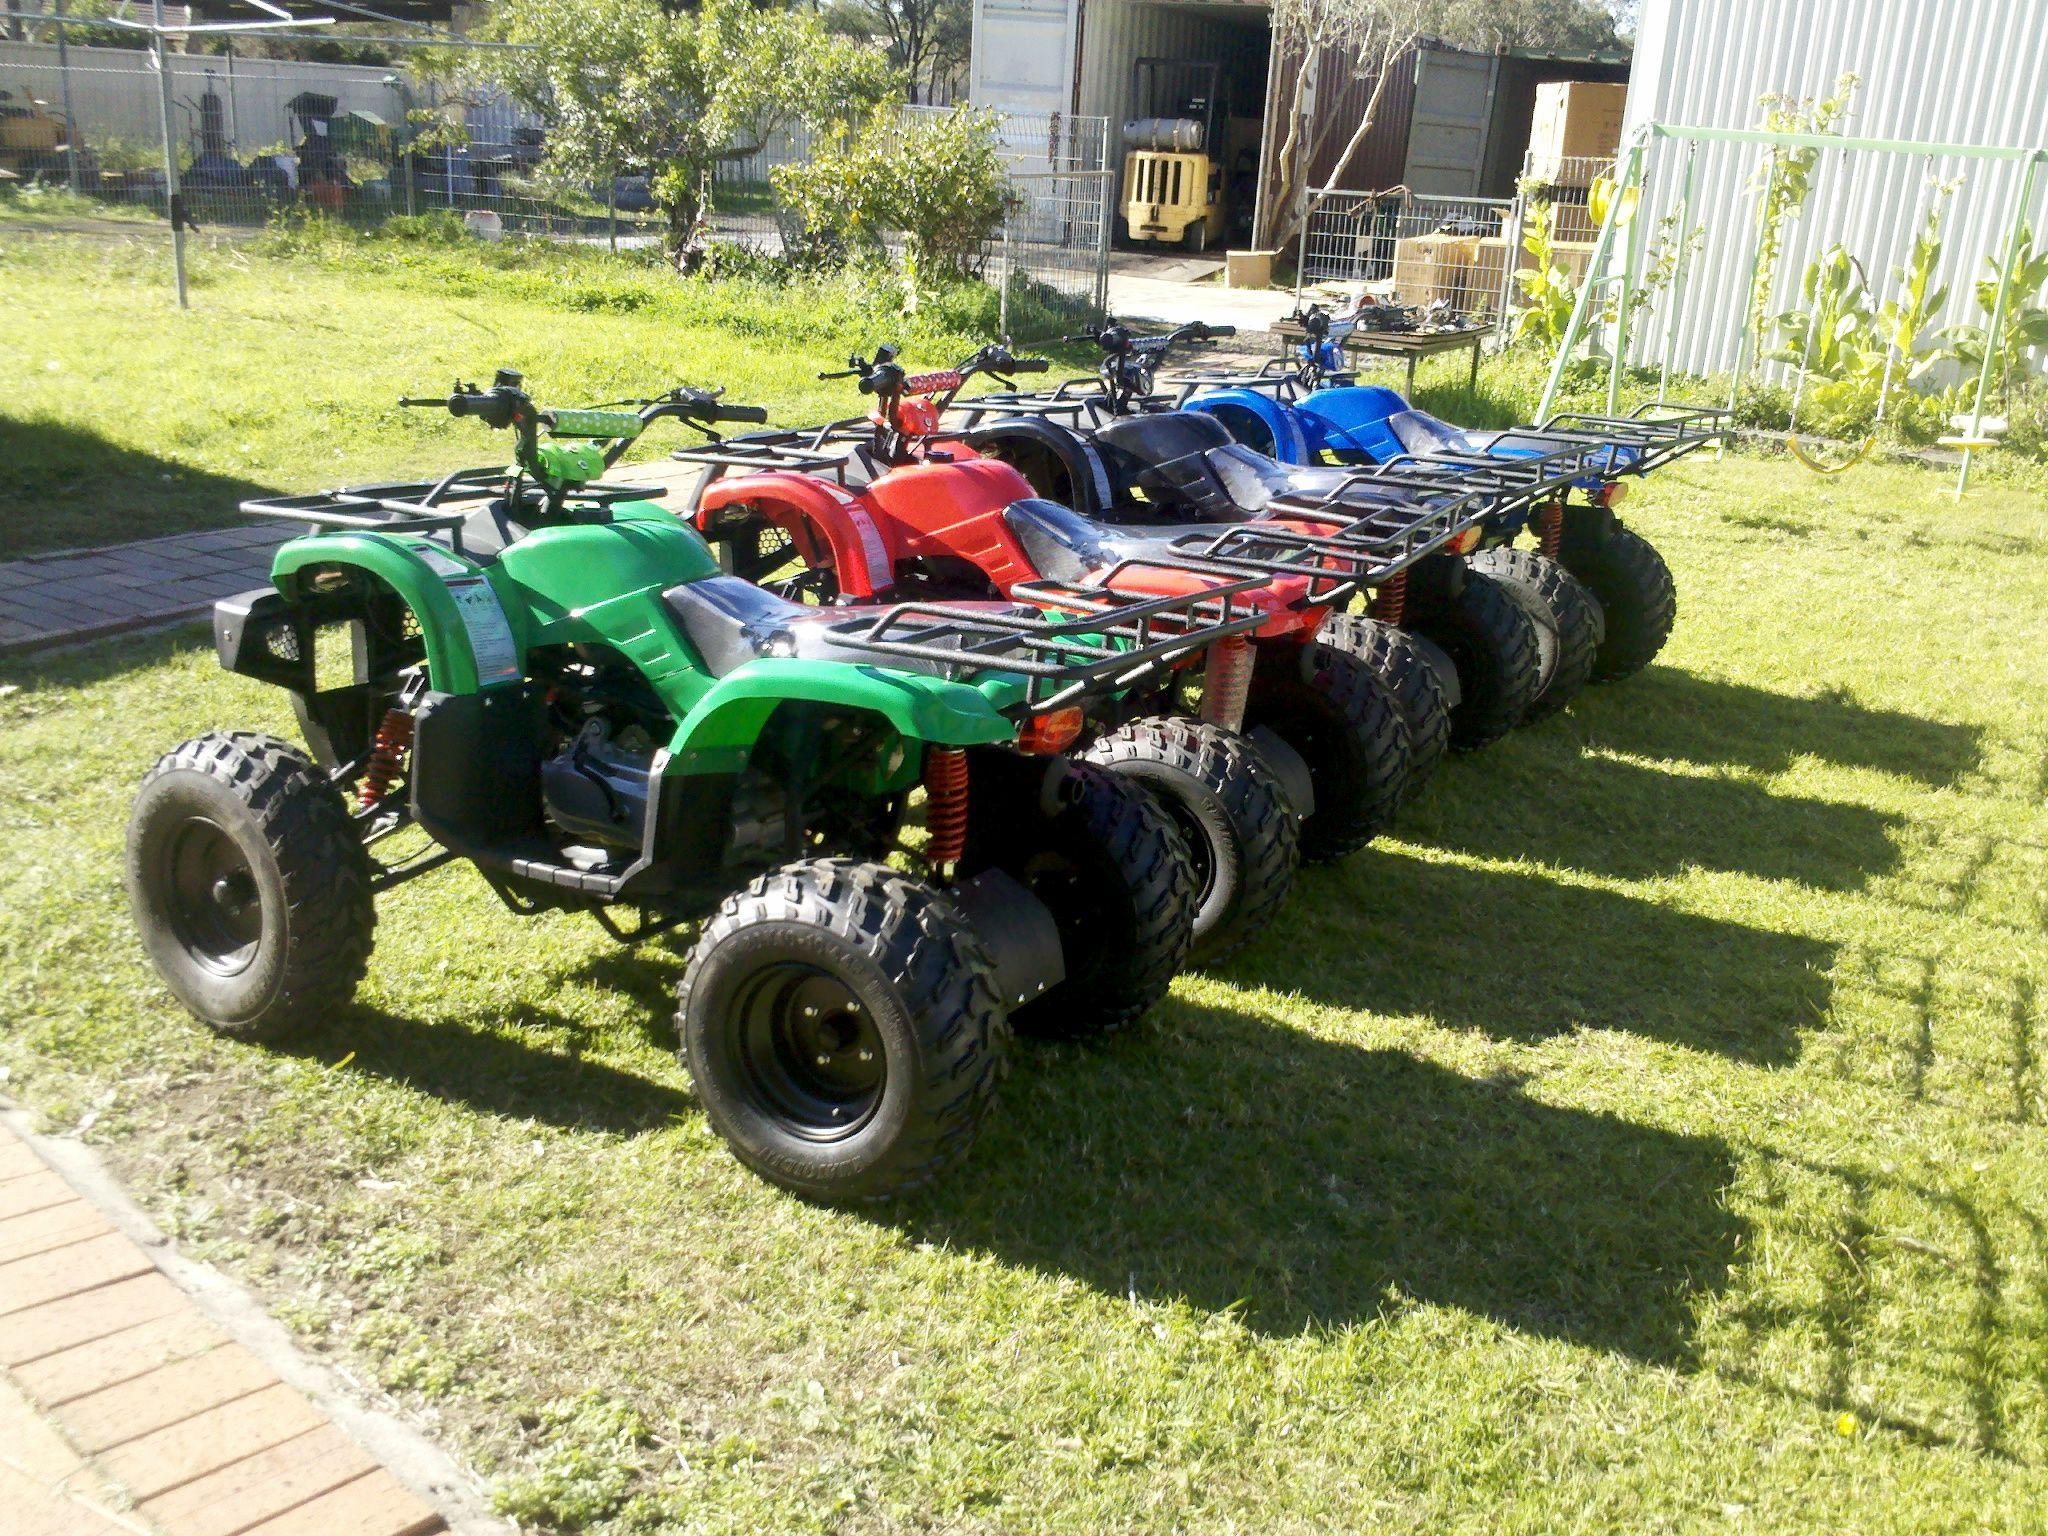 250cc Automatic Quads Gy6 Engine Ekectric And Kick Start Atv